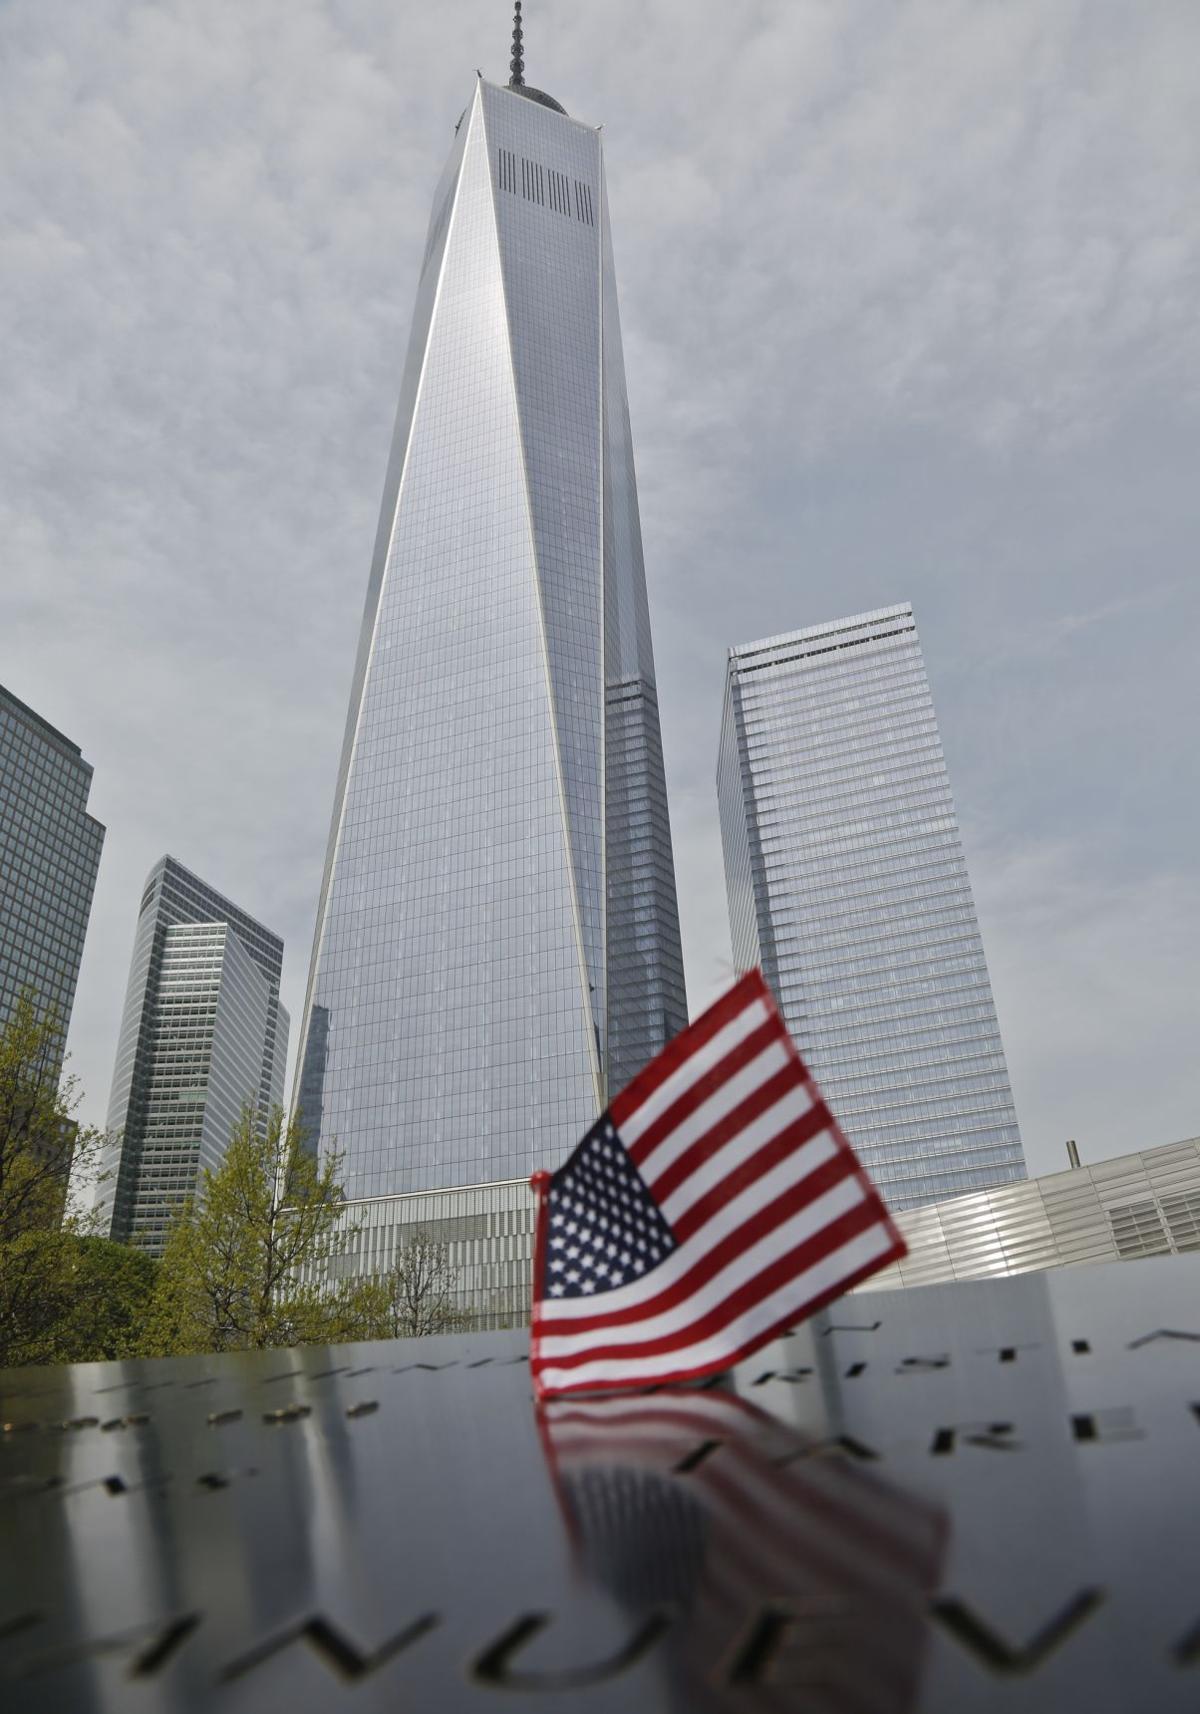 Let freedom sing at Ground Zero